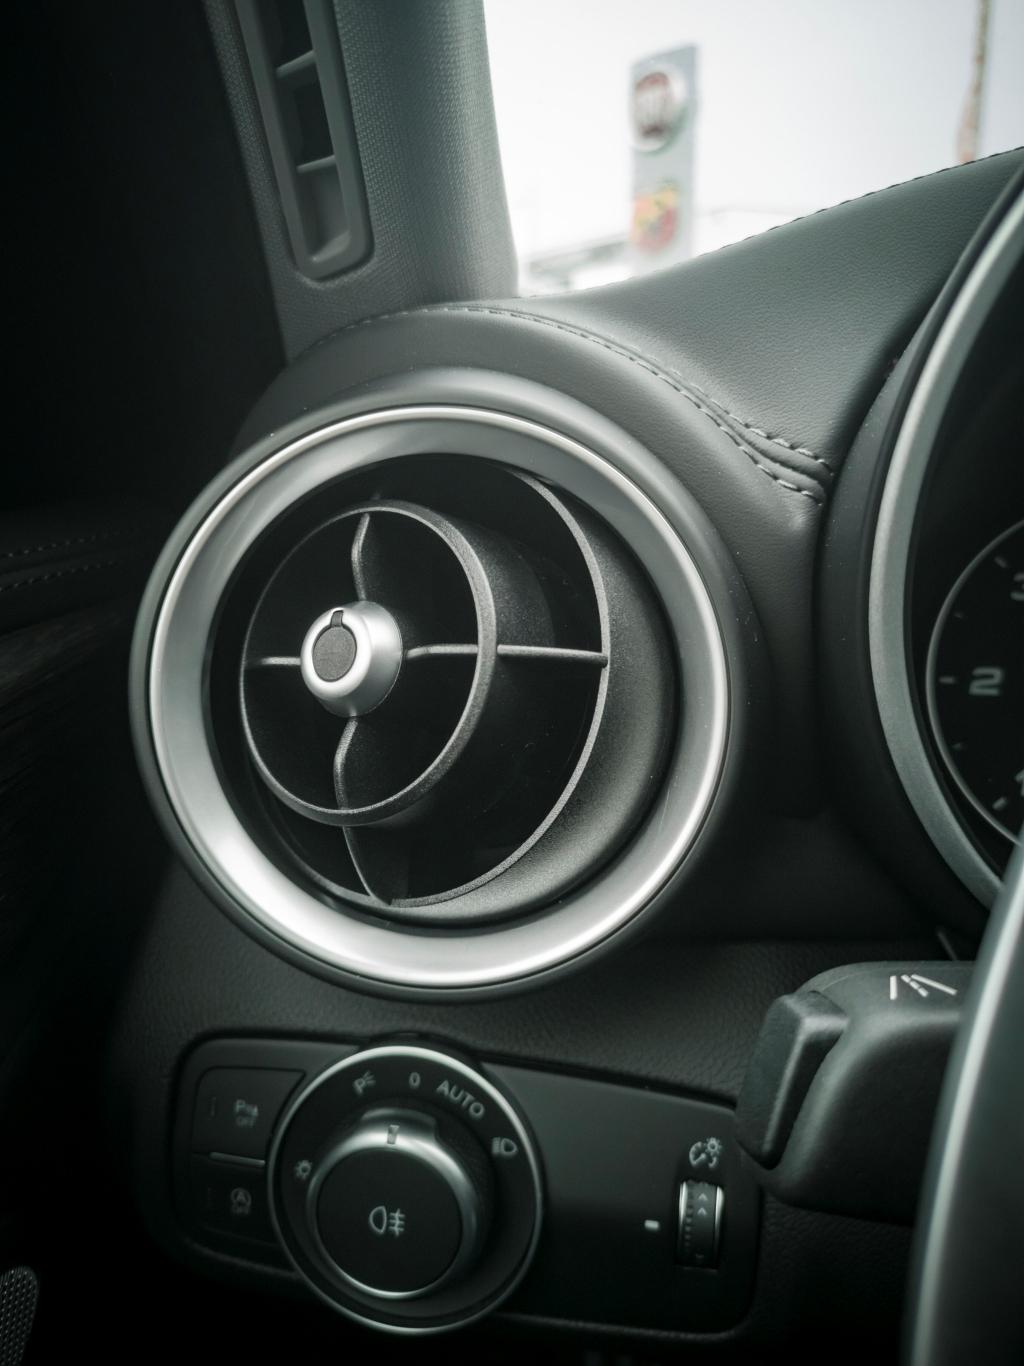 Aérateur inspiré du monde de l'aviation- Alfa Romeo Giulia, dame de coeur